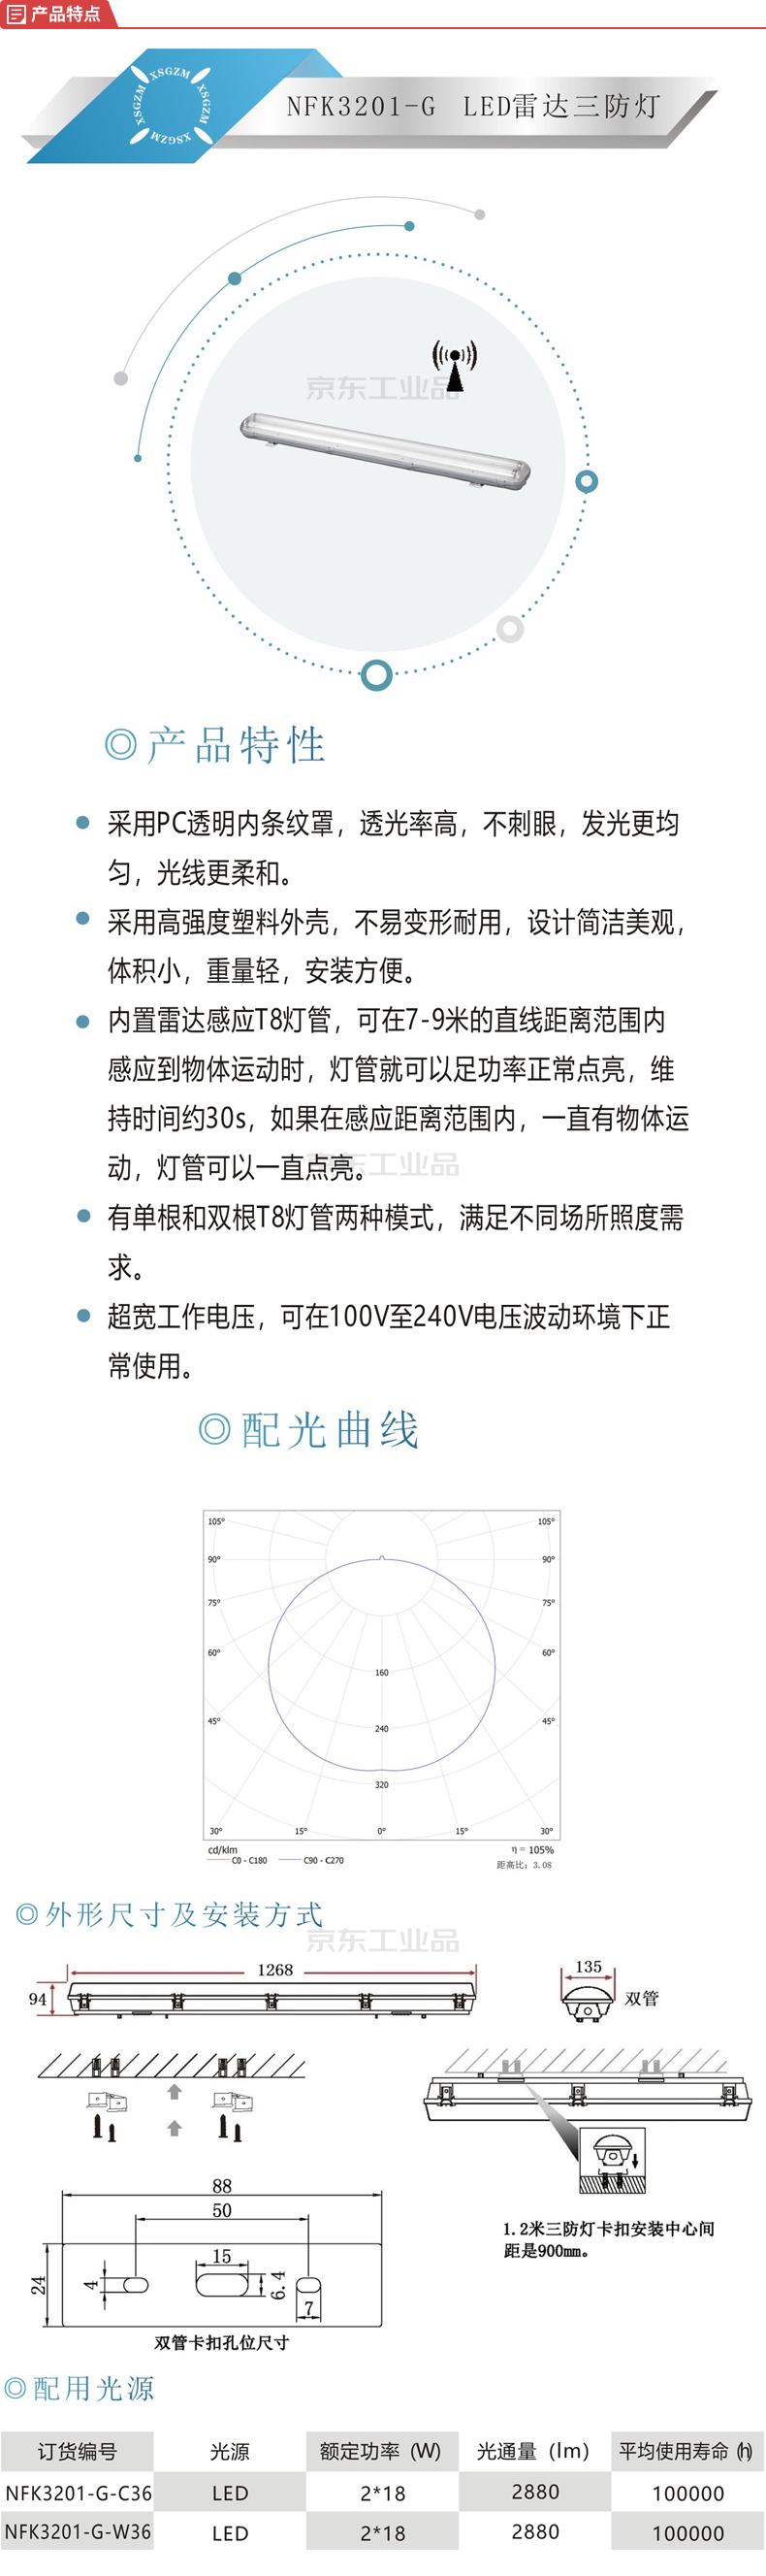 新曙光 LED雷达三防灯 36W;NFK3201-G (1260mm 2*18W) 36W